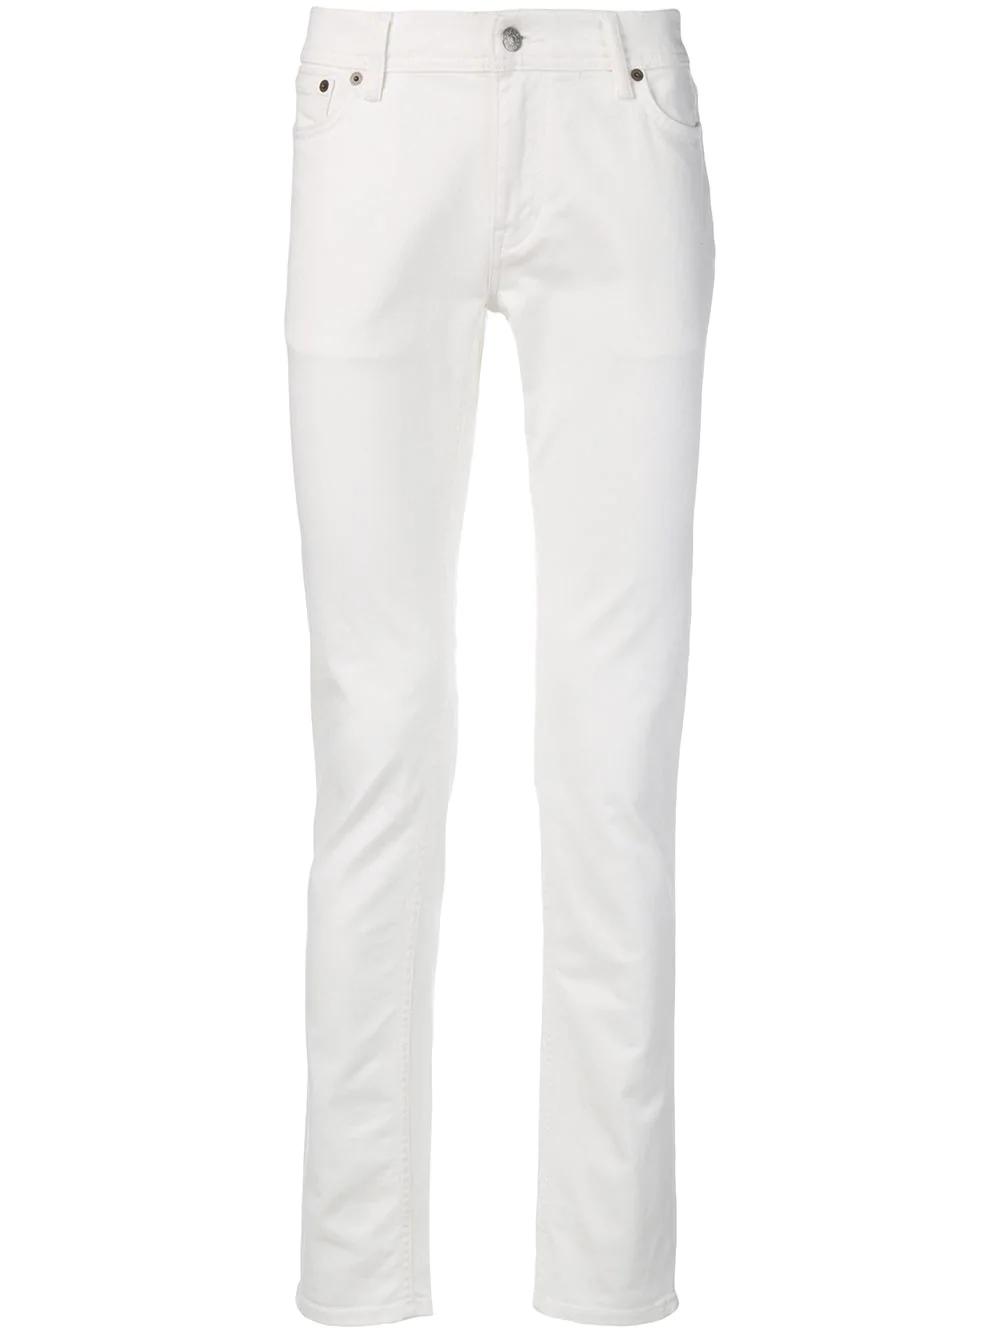 e5fb5c77 Acne Studios North Slim Fit Jeans - White | ModeSens